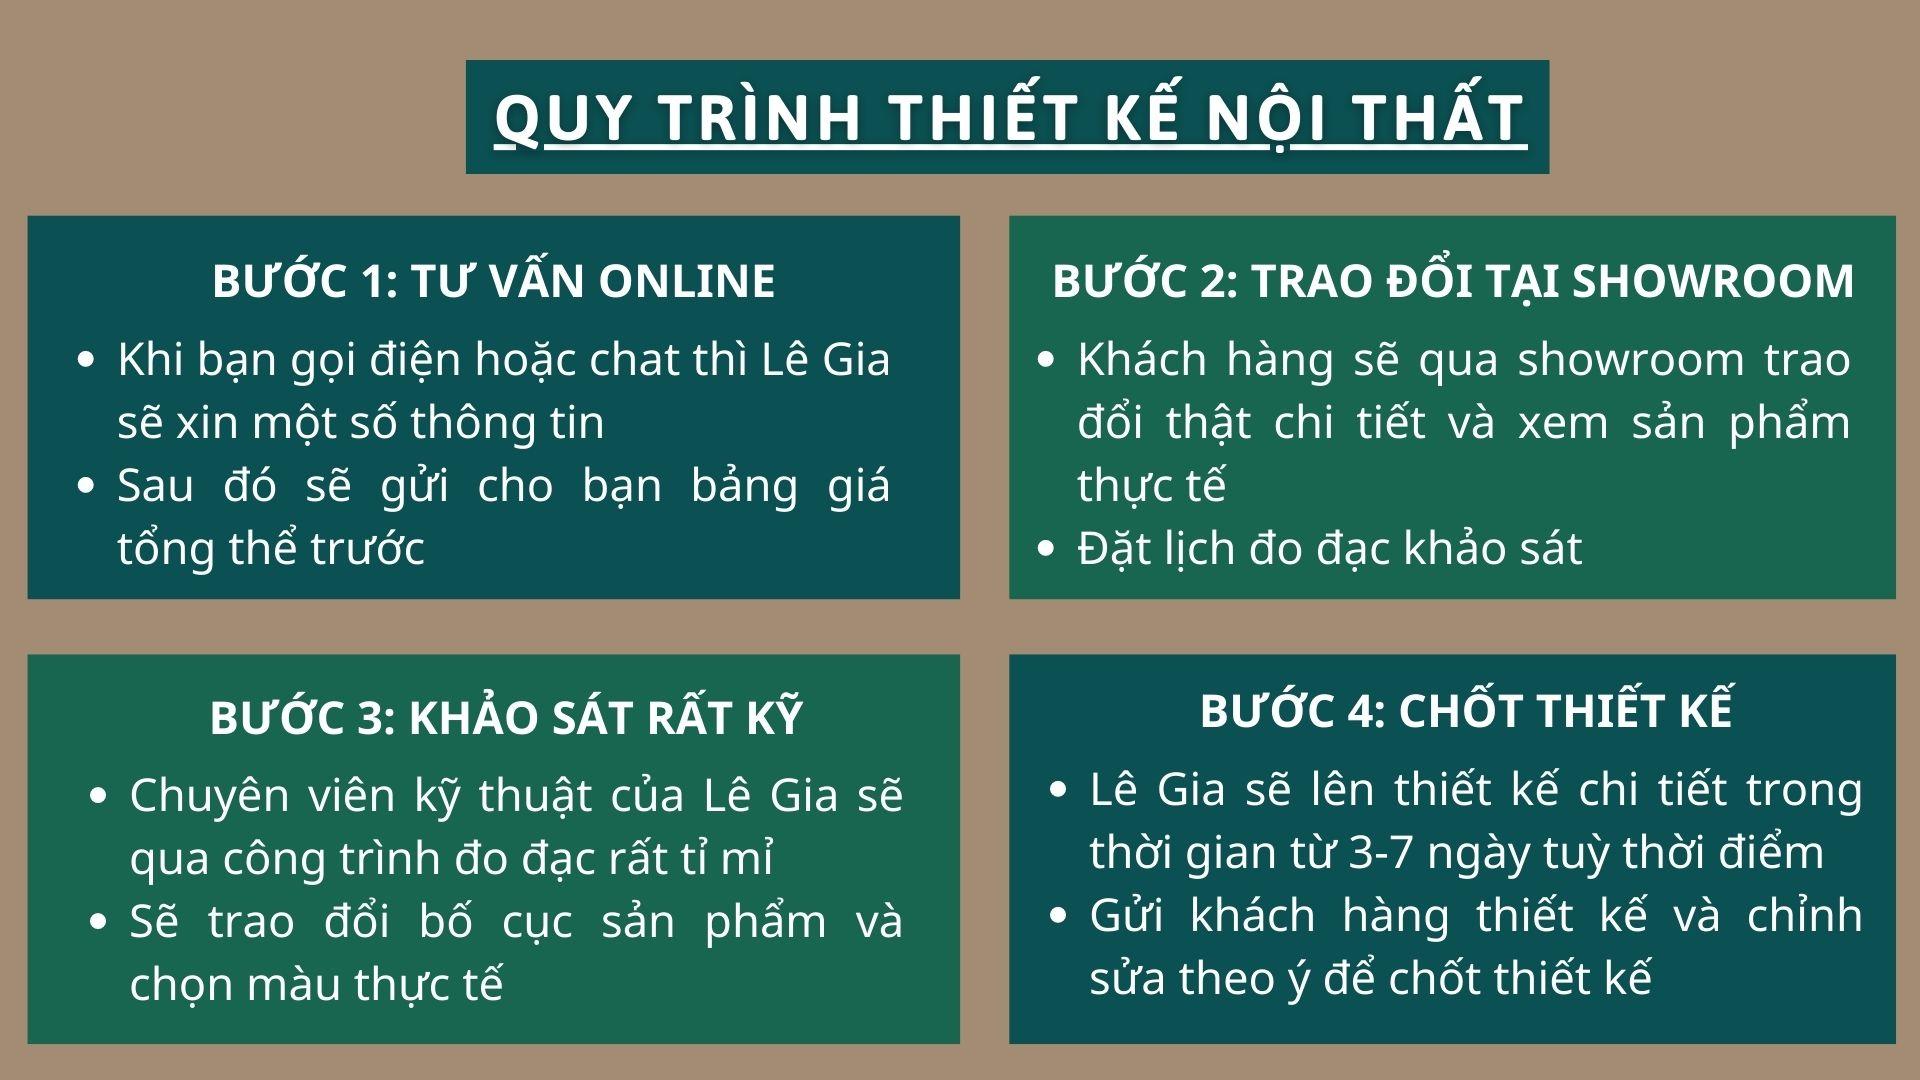 Quy Trinh Thiet Ke Noi That Cao Cao Chung Cu Hien Dai